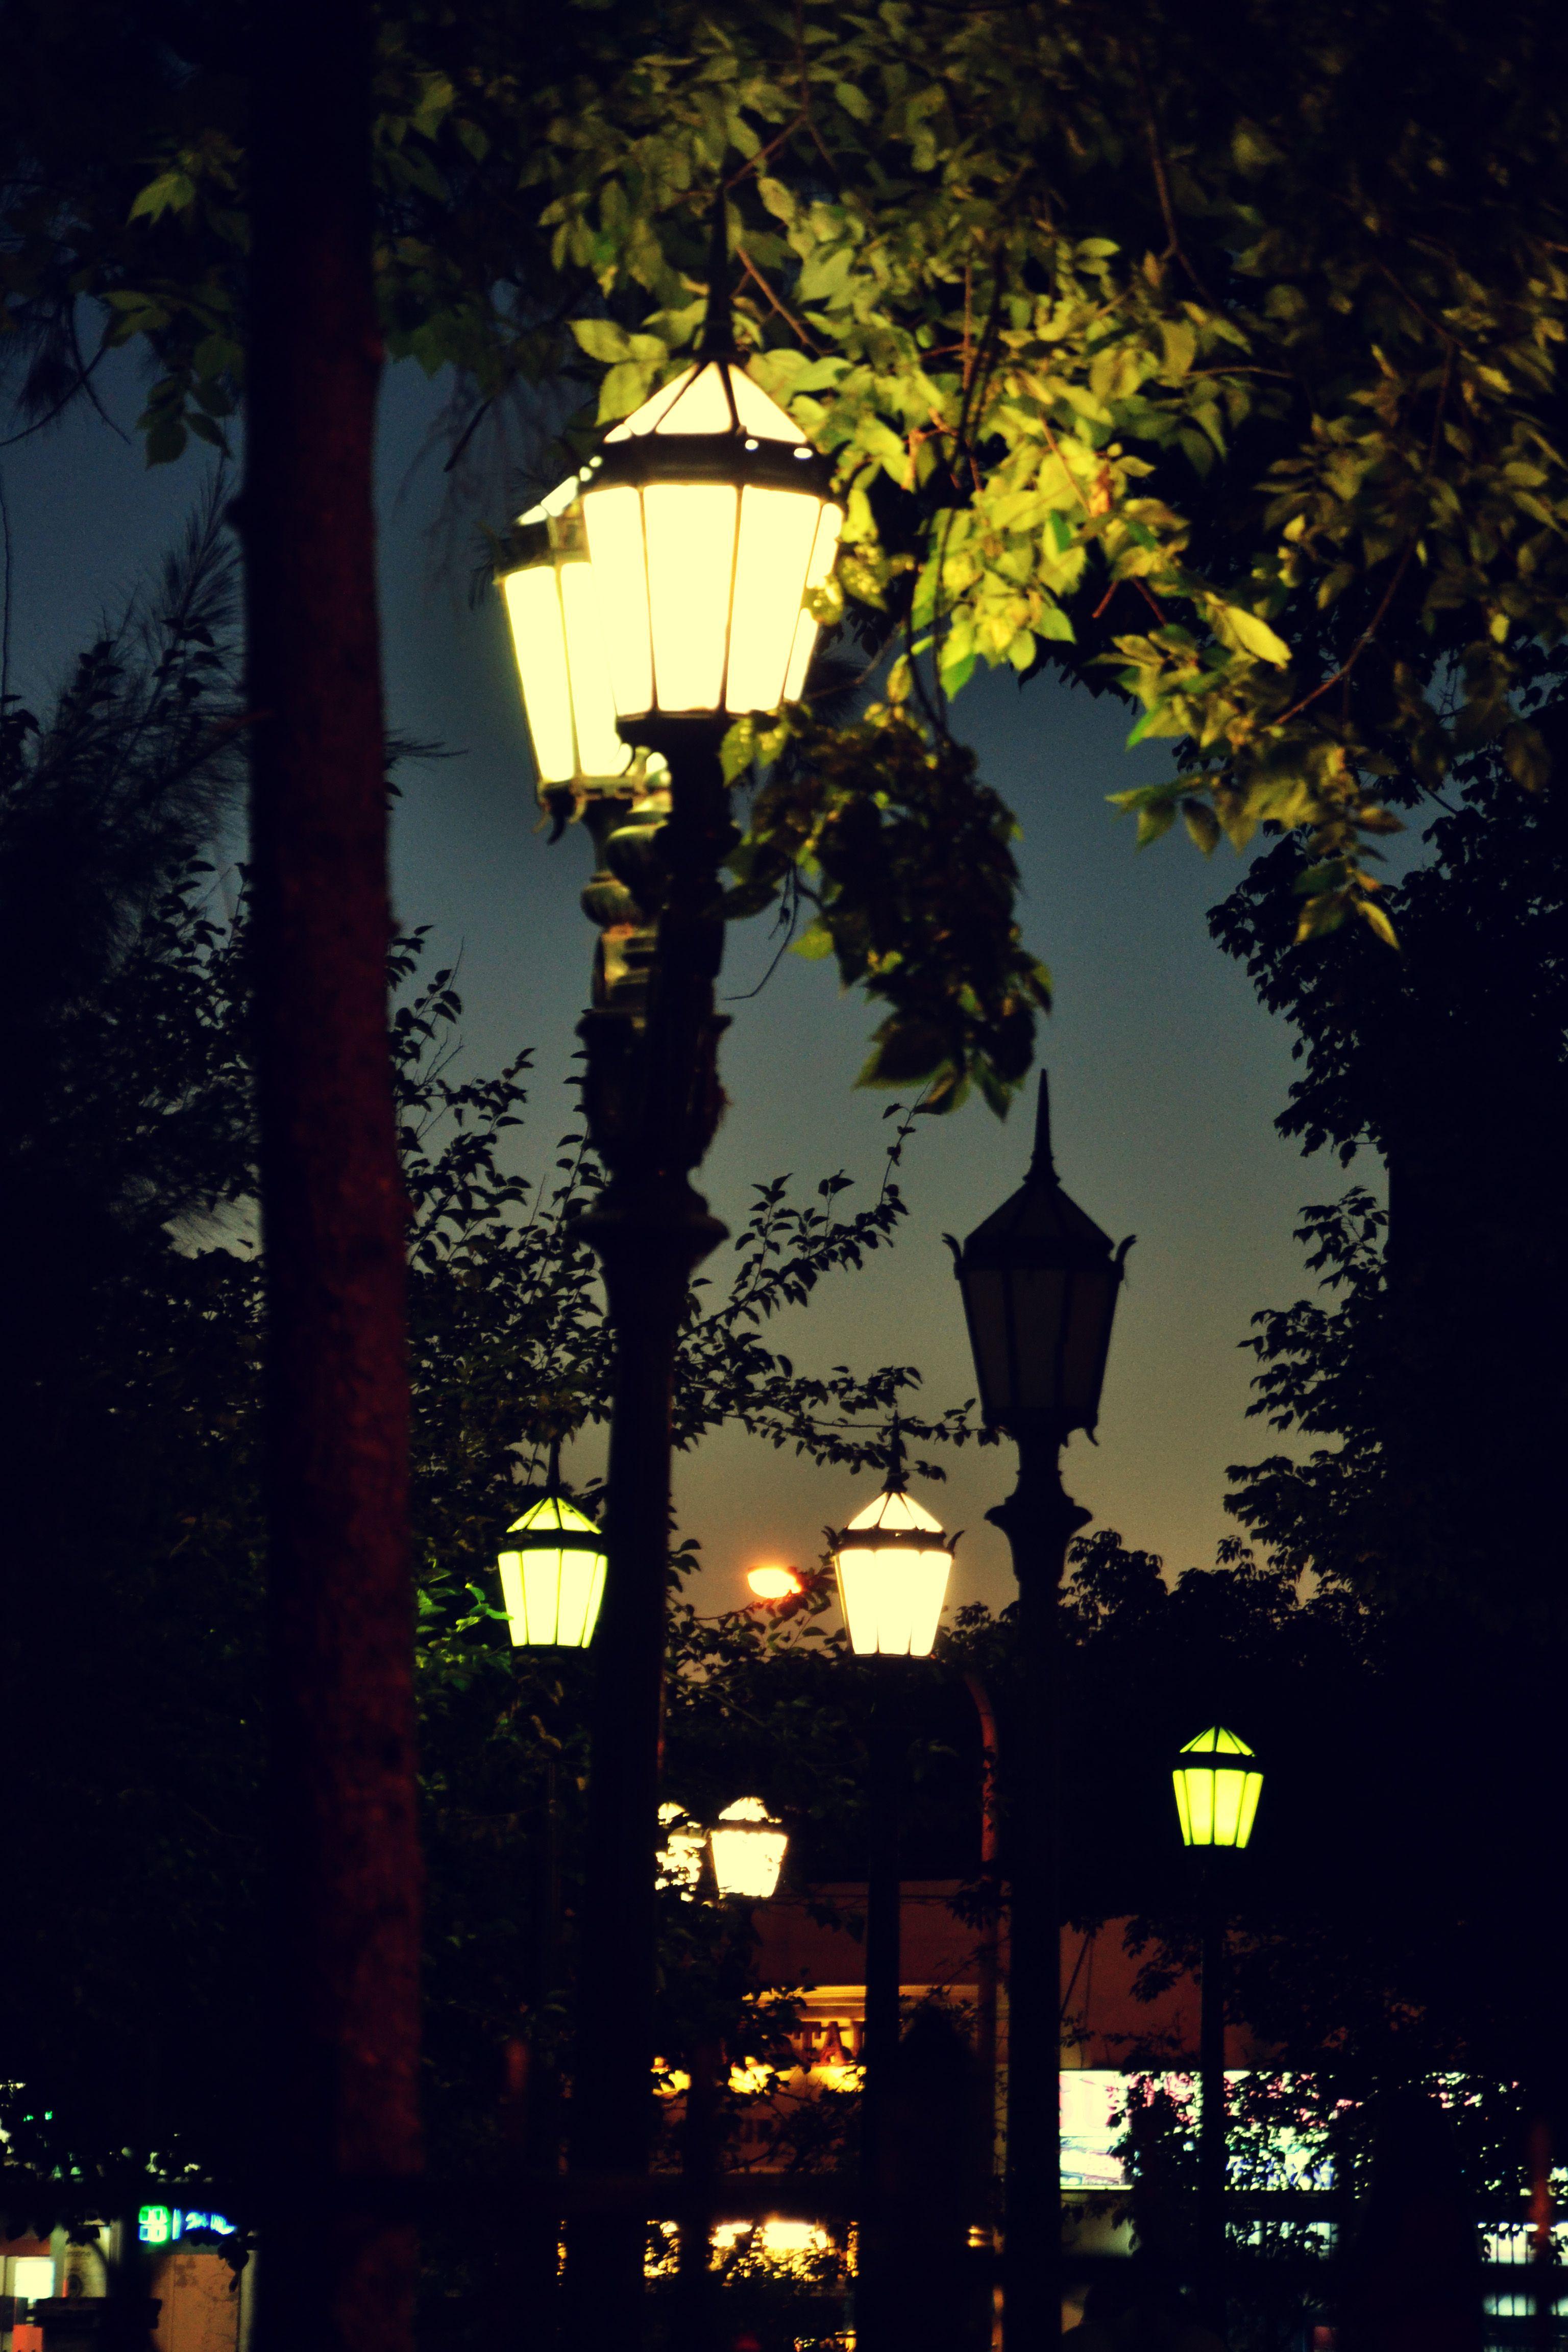 Street Lamps At Night Lamp City